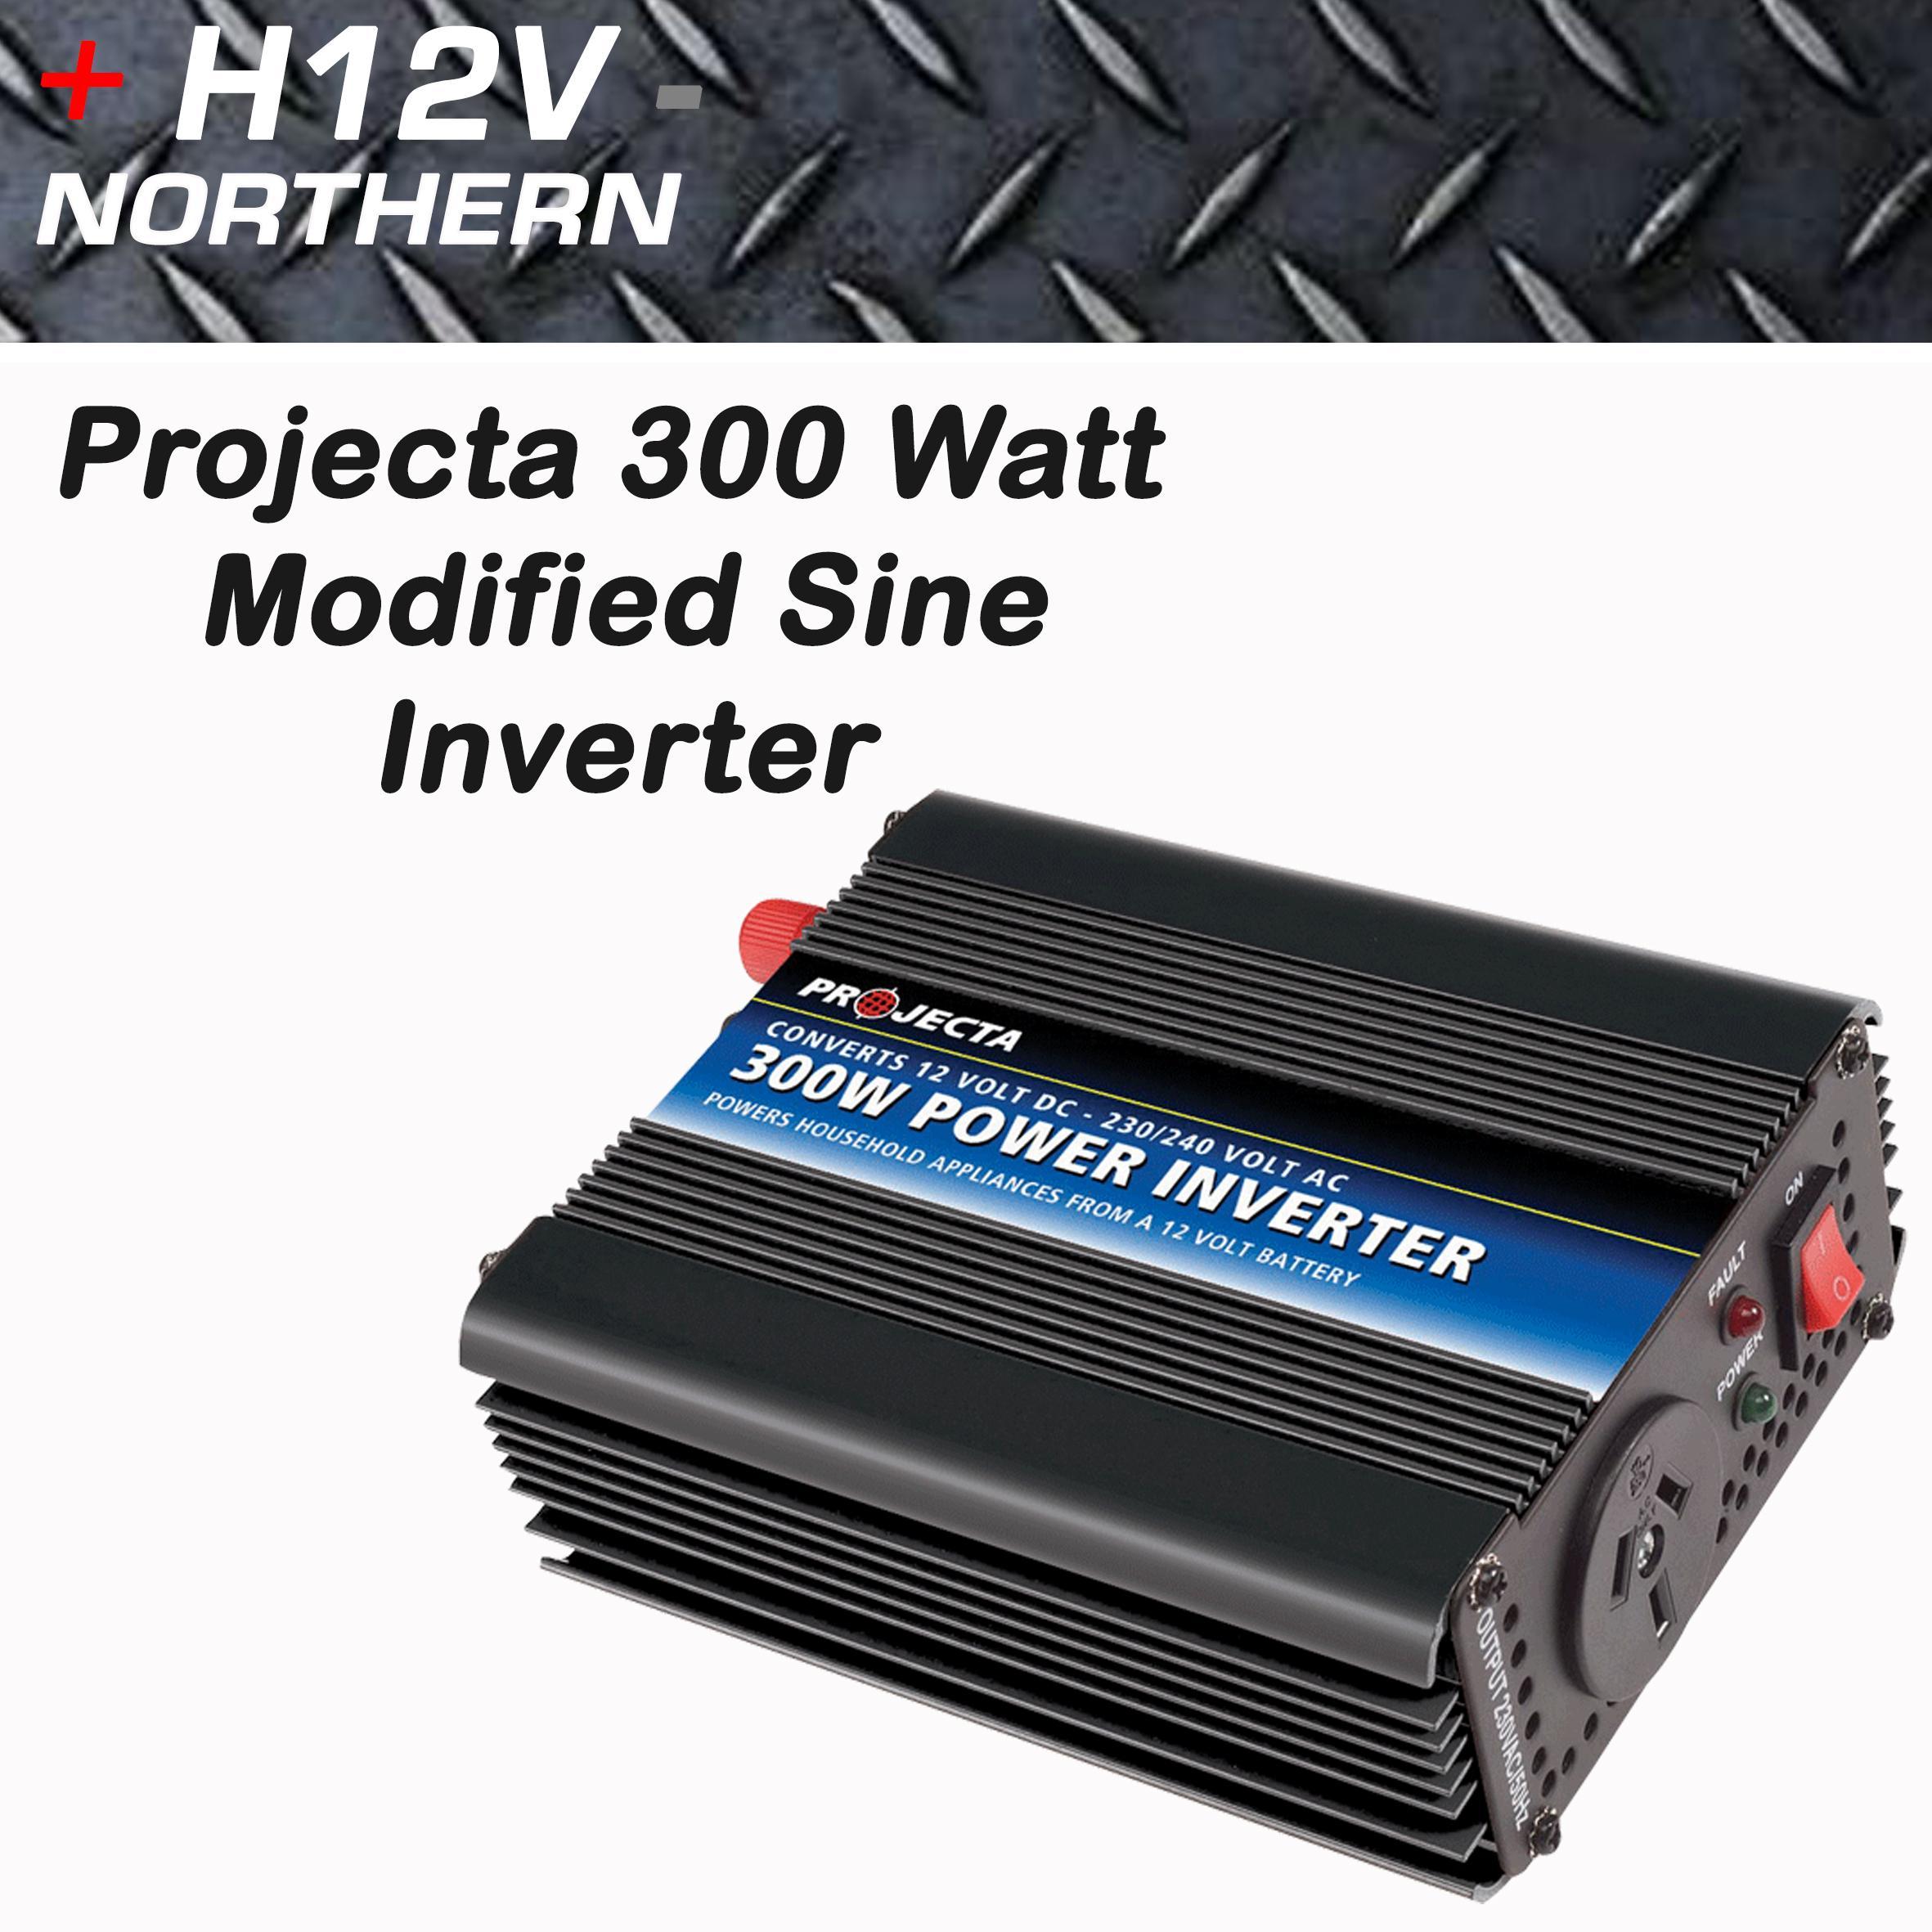 Projecta 300 Watt Modified Sine Inverter Home Of 12 Volt Dc To Ac Power